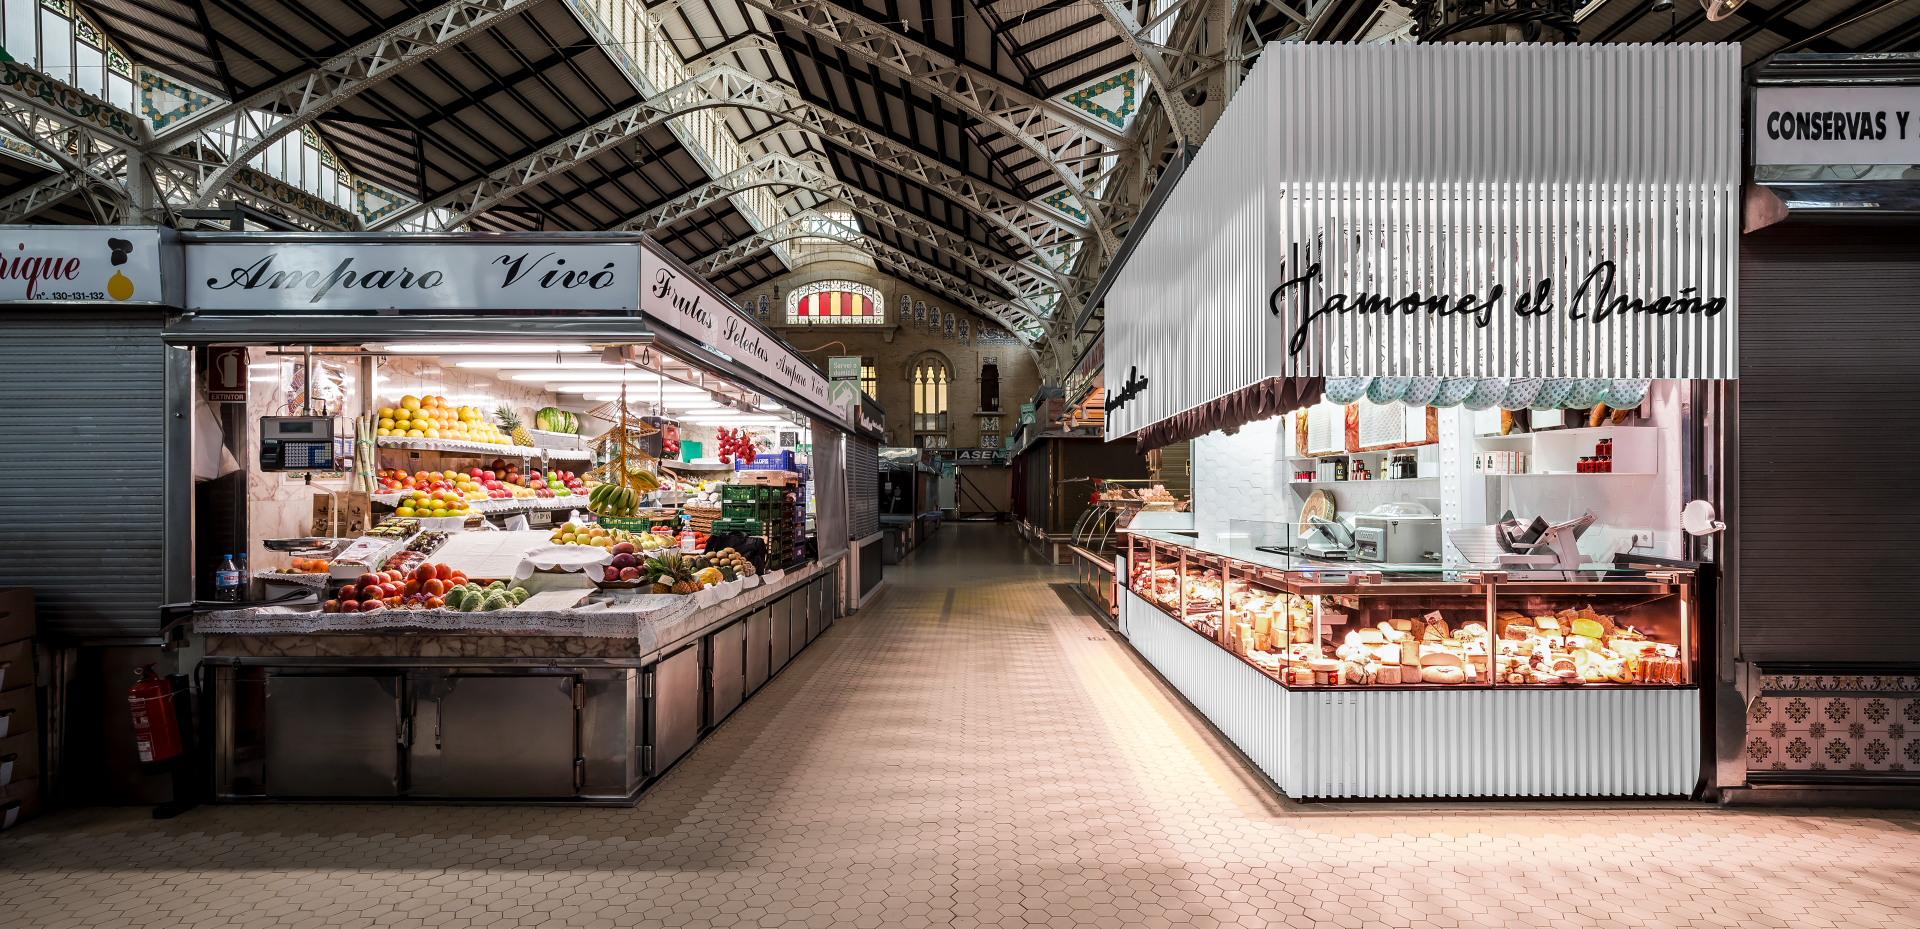 fotografia-arquitectura-valencia-german-cabo-lujan-mercado-central-jamones (3)